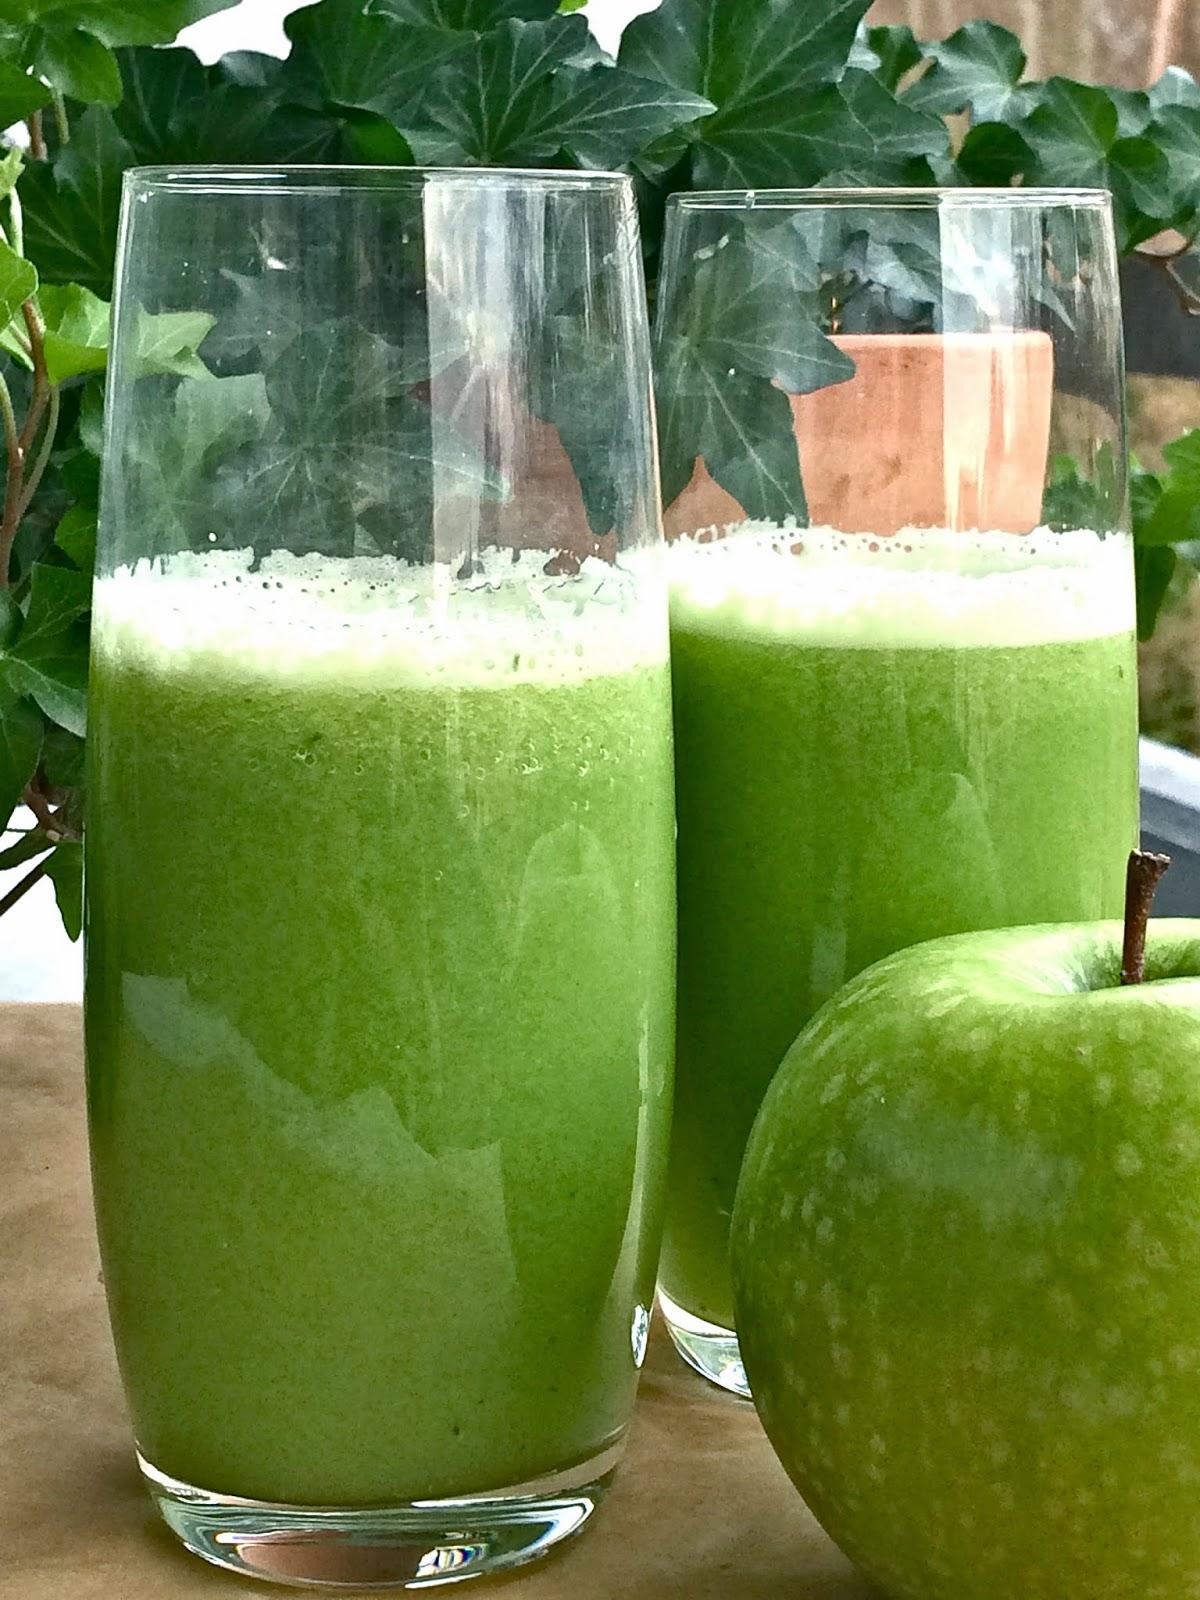 Passionately Raw Delicious Green Detox Juice Recipe